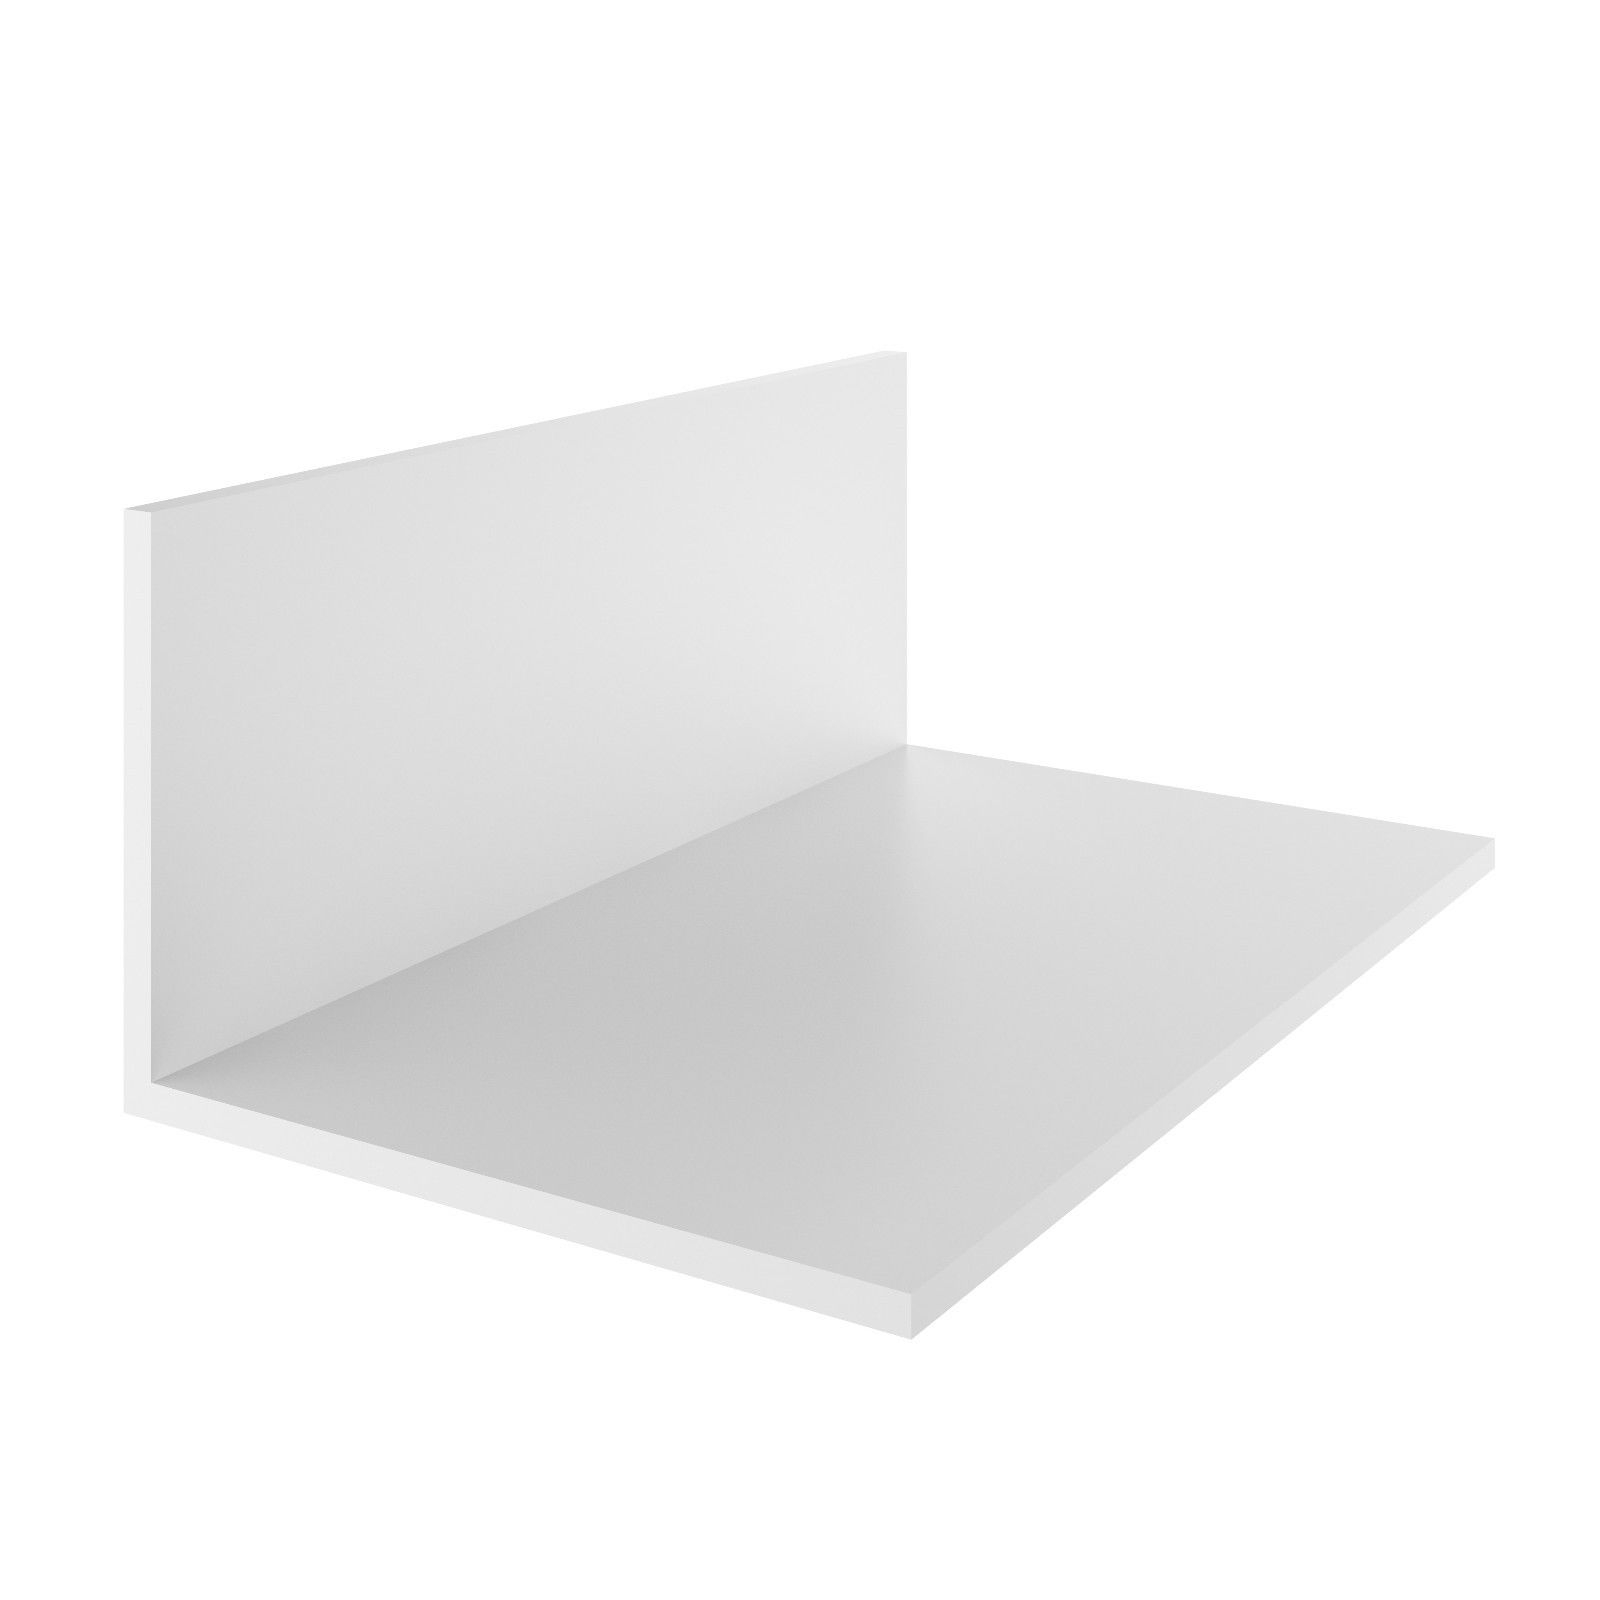 """2,13€/m"" 1,5m Profil Eckleiste Aussenwinkel PVC-Winkel Winkelprofil    30x30 mm"